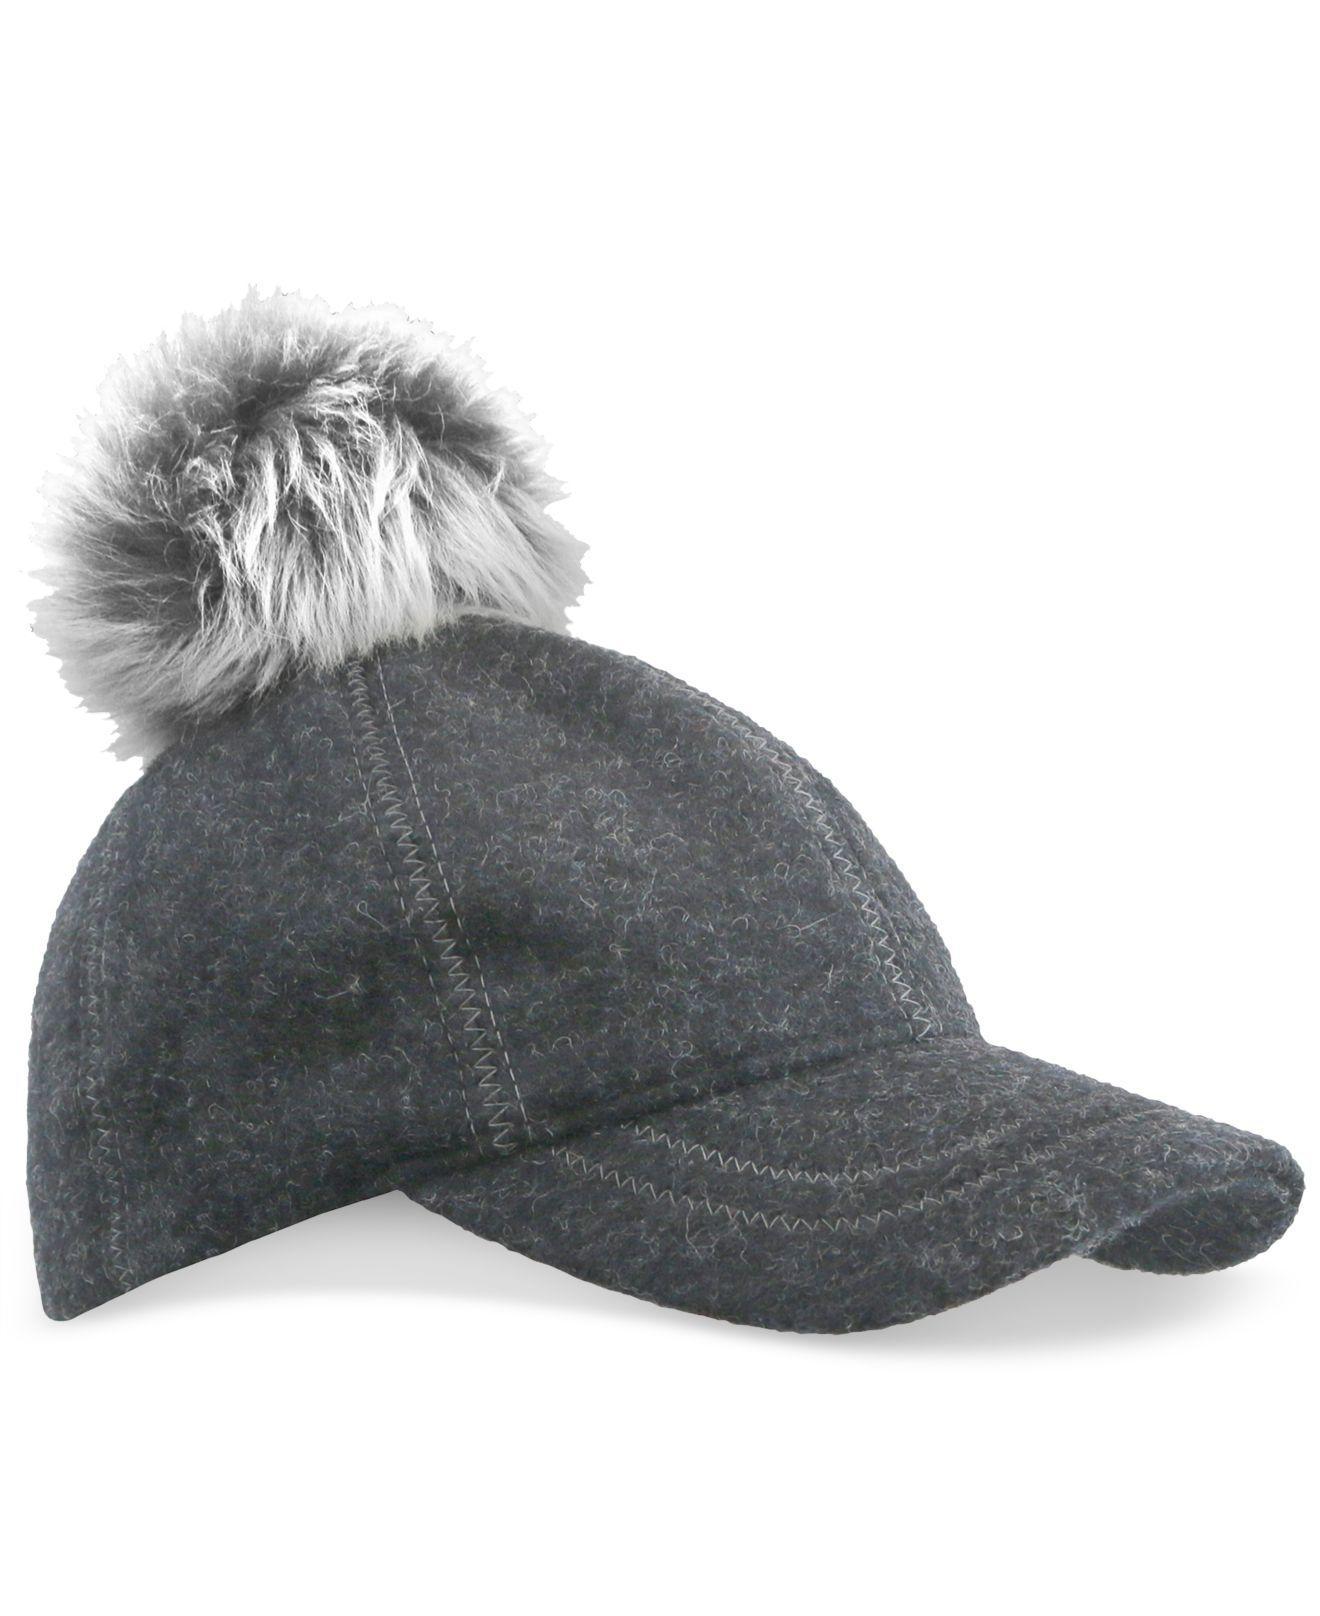 64f41c3c906 Lyst - UGG Fur Pom Pom Baseball Hat in Black